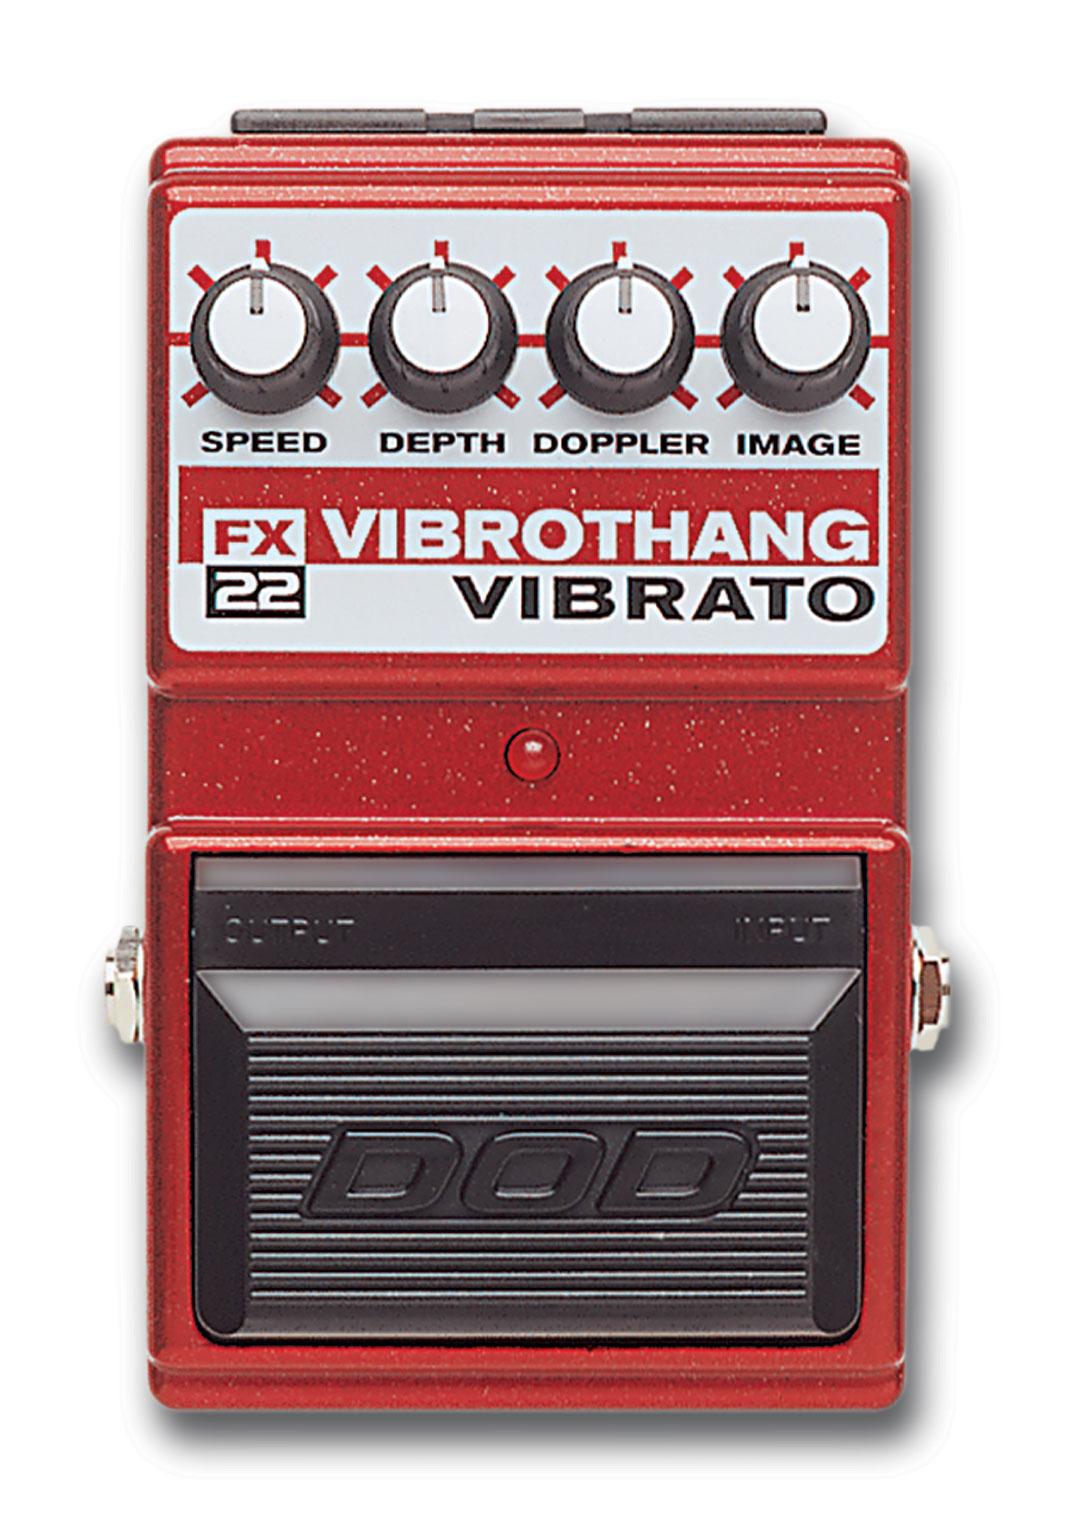 Fx22 Dod Tremolo Effect Circuit Using Ua741 Vibrothang Vibrato